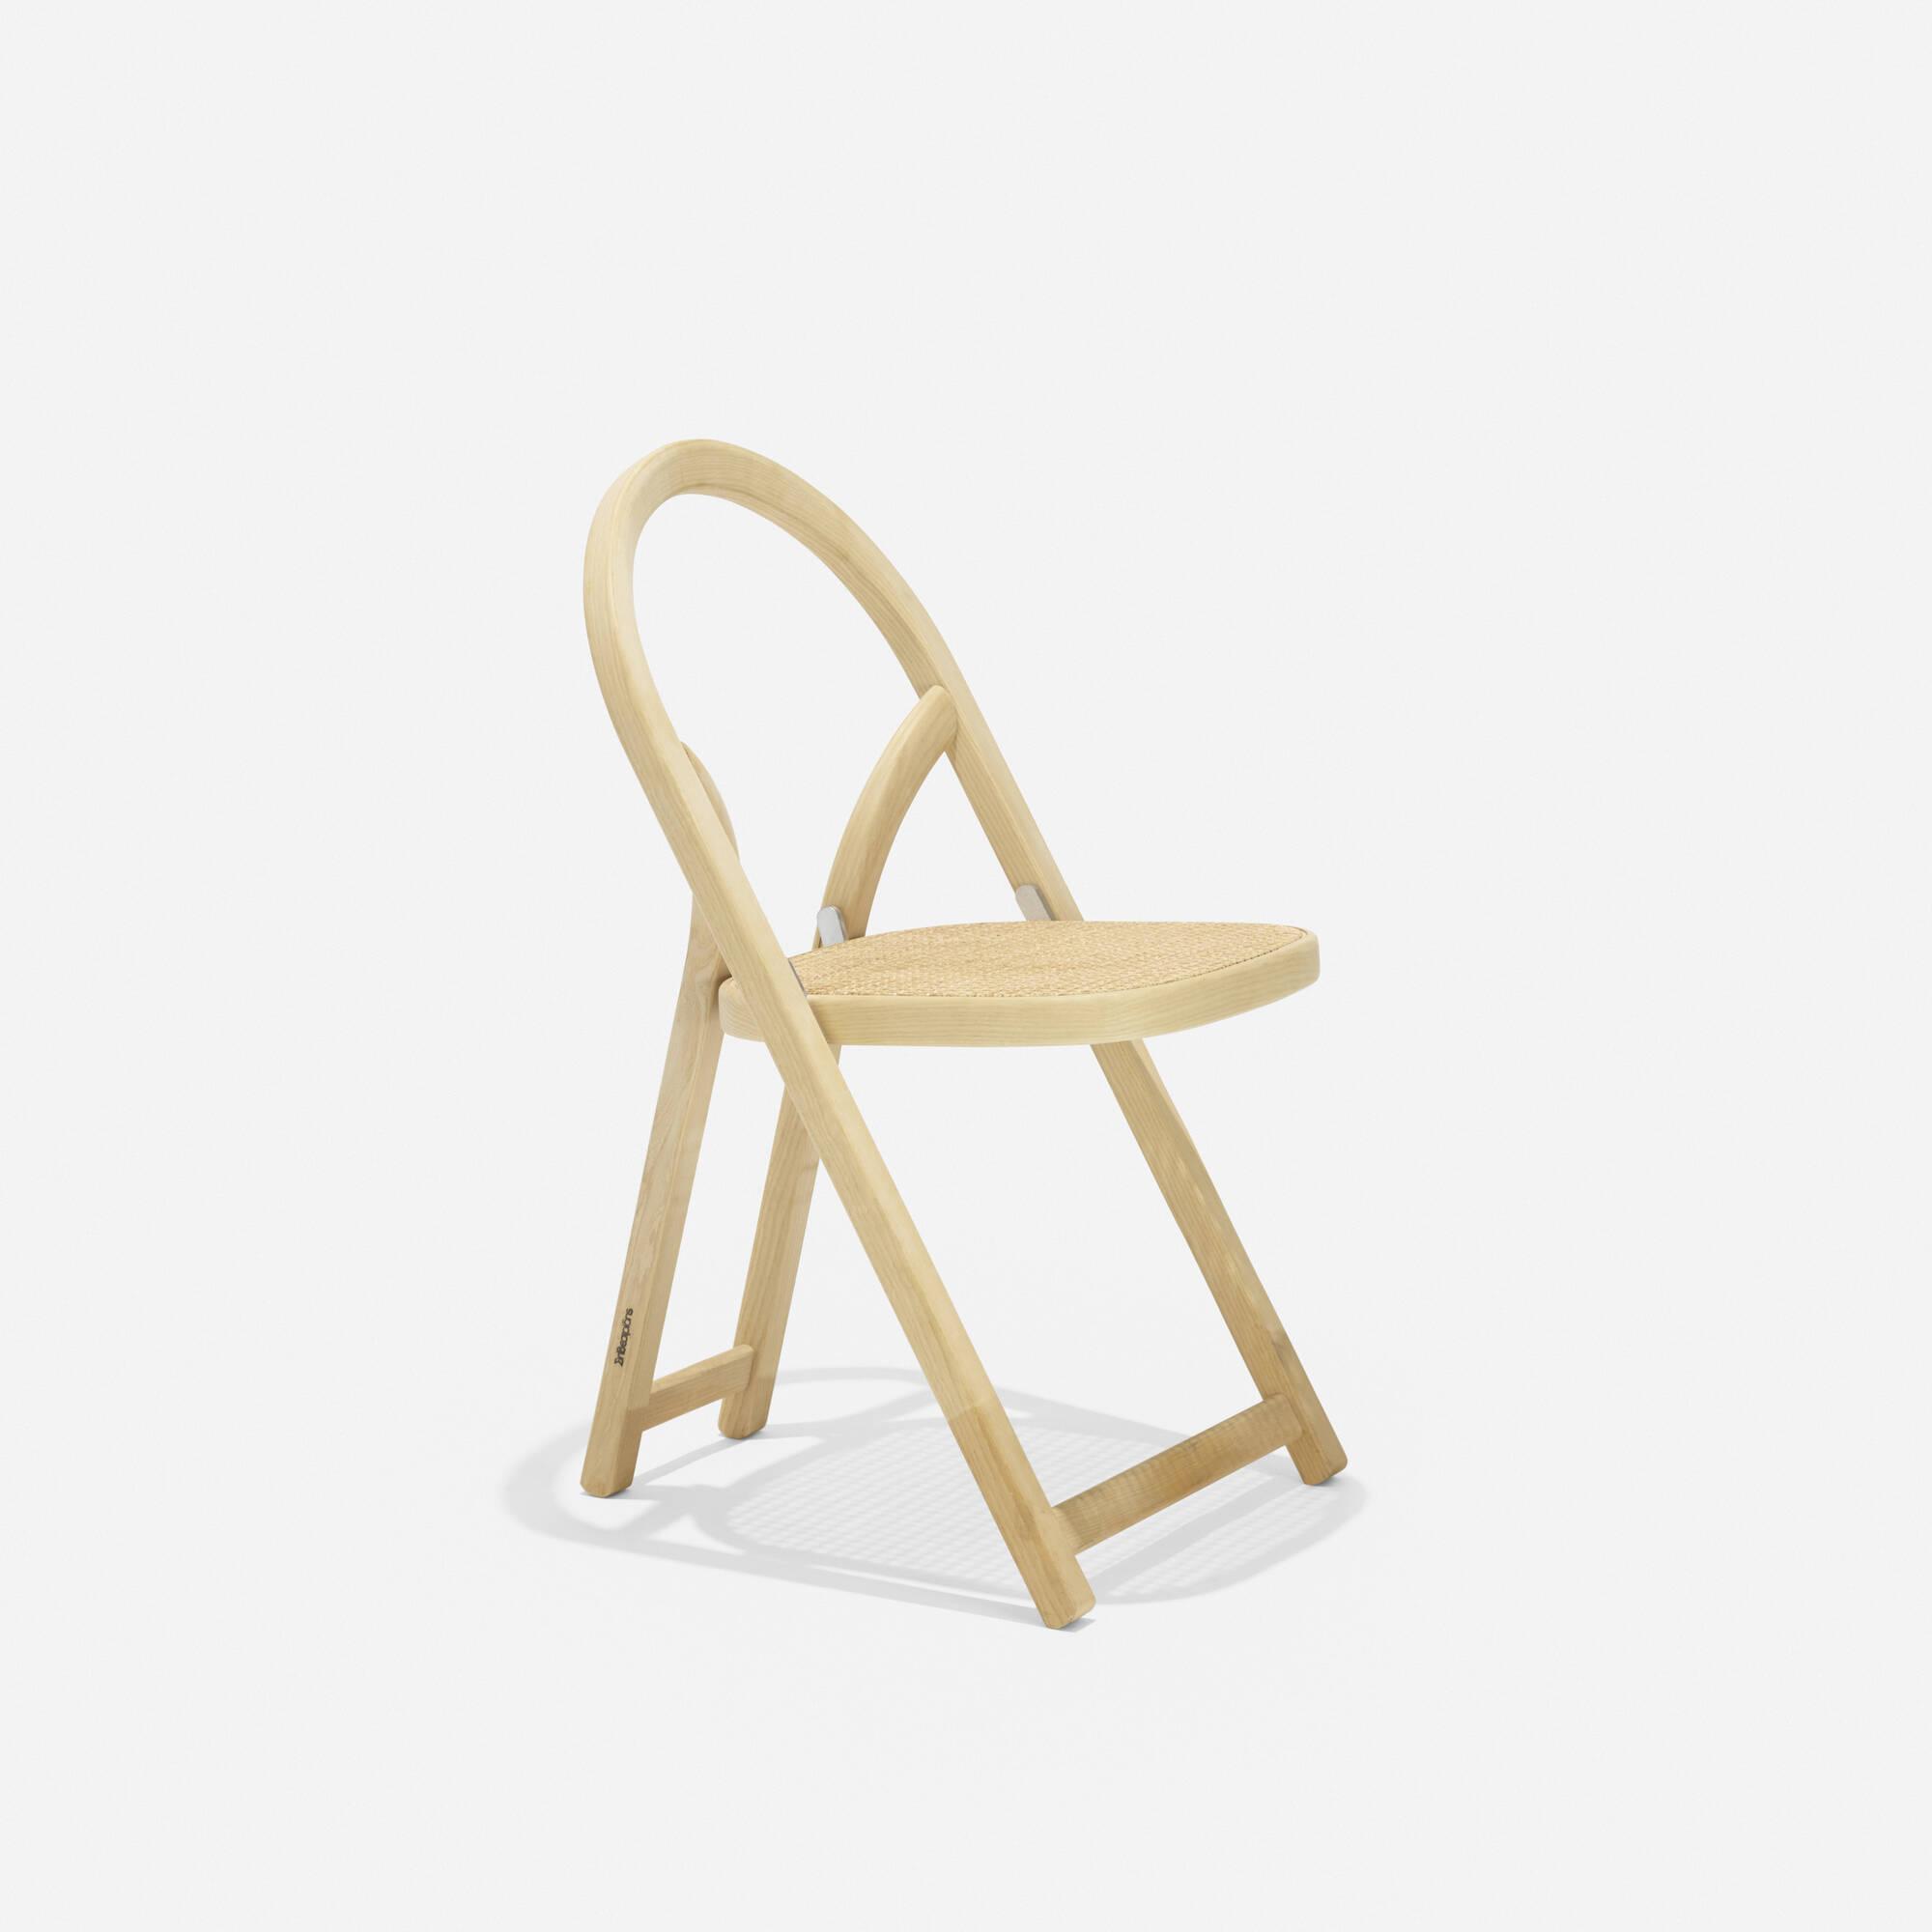 344: Gigi Sabadin / Arca chair (1 of 3)